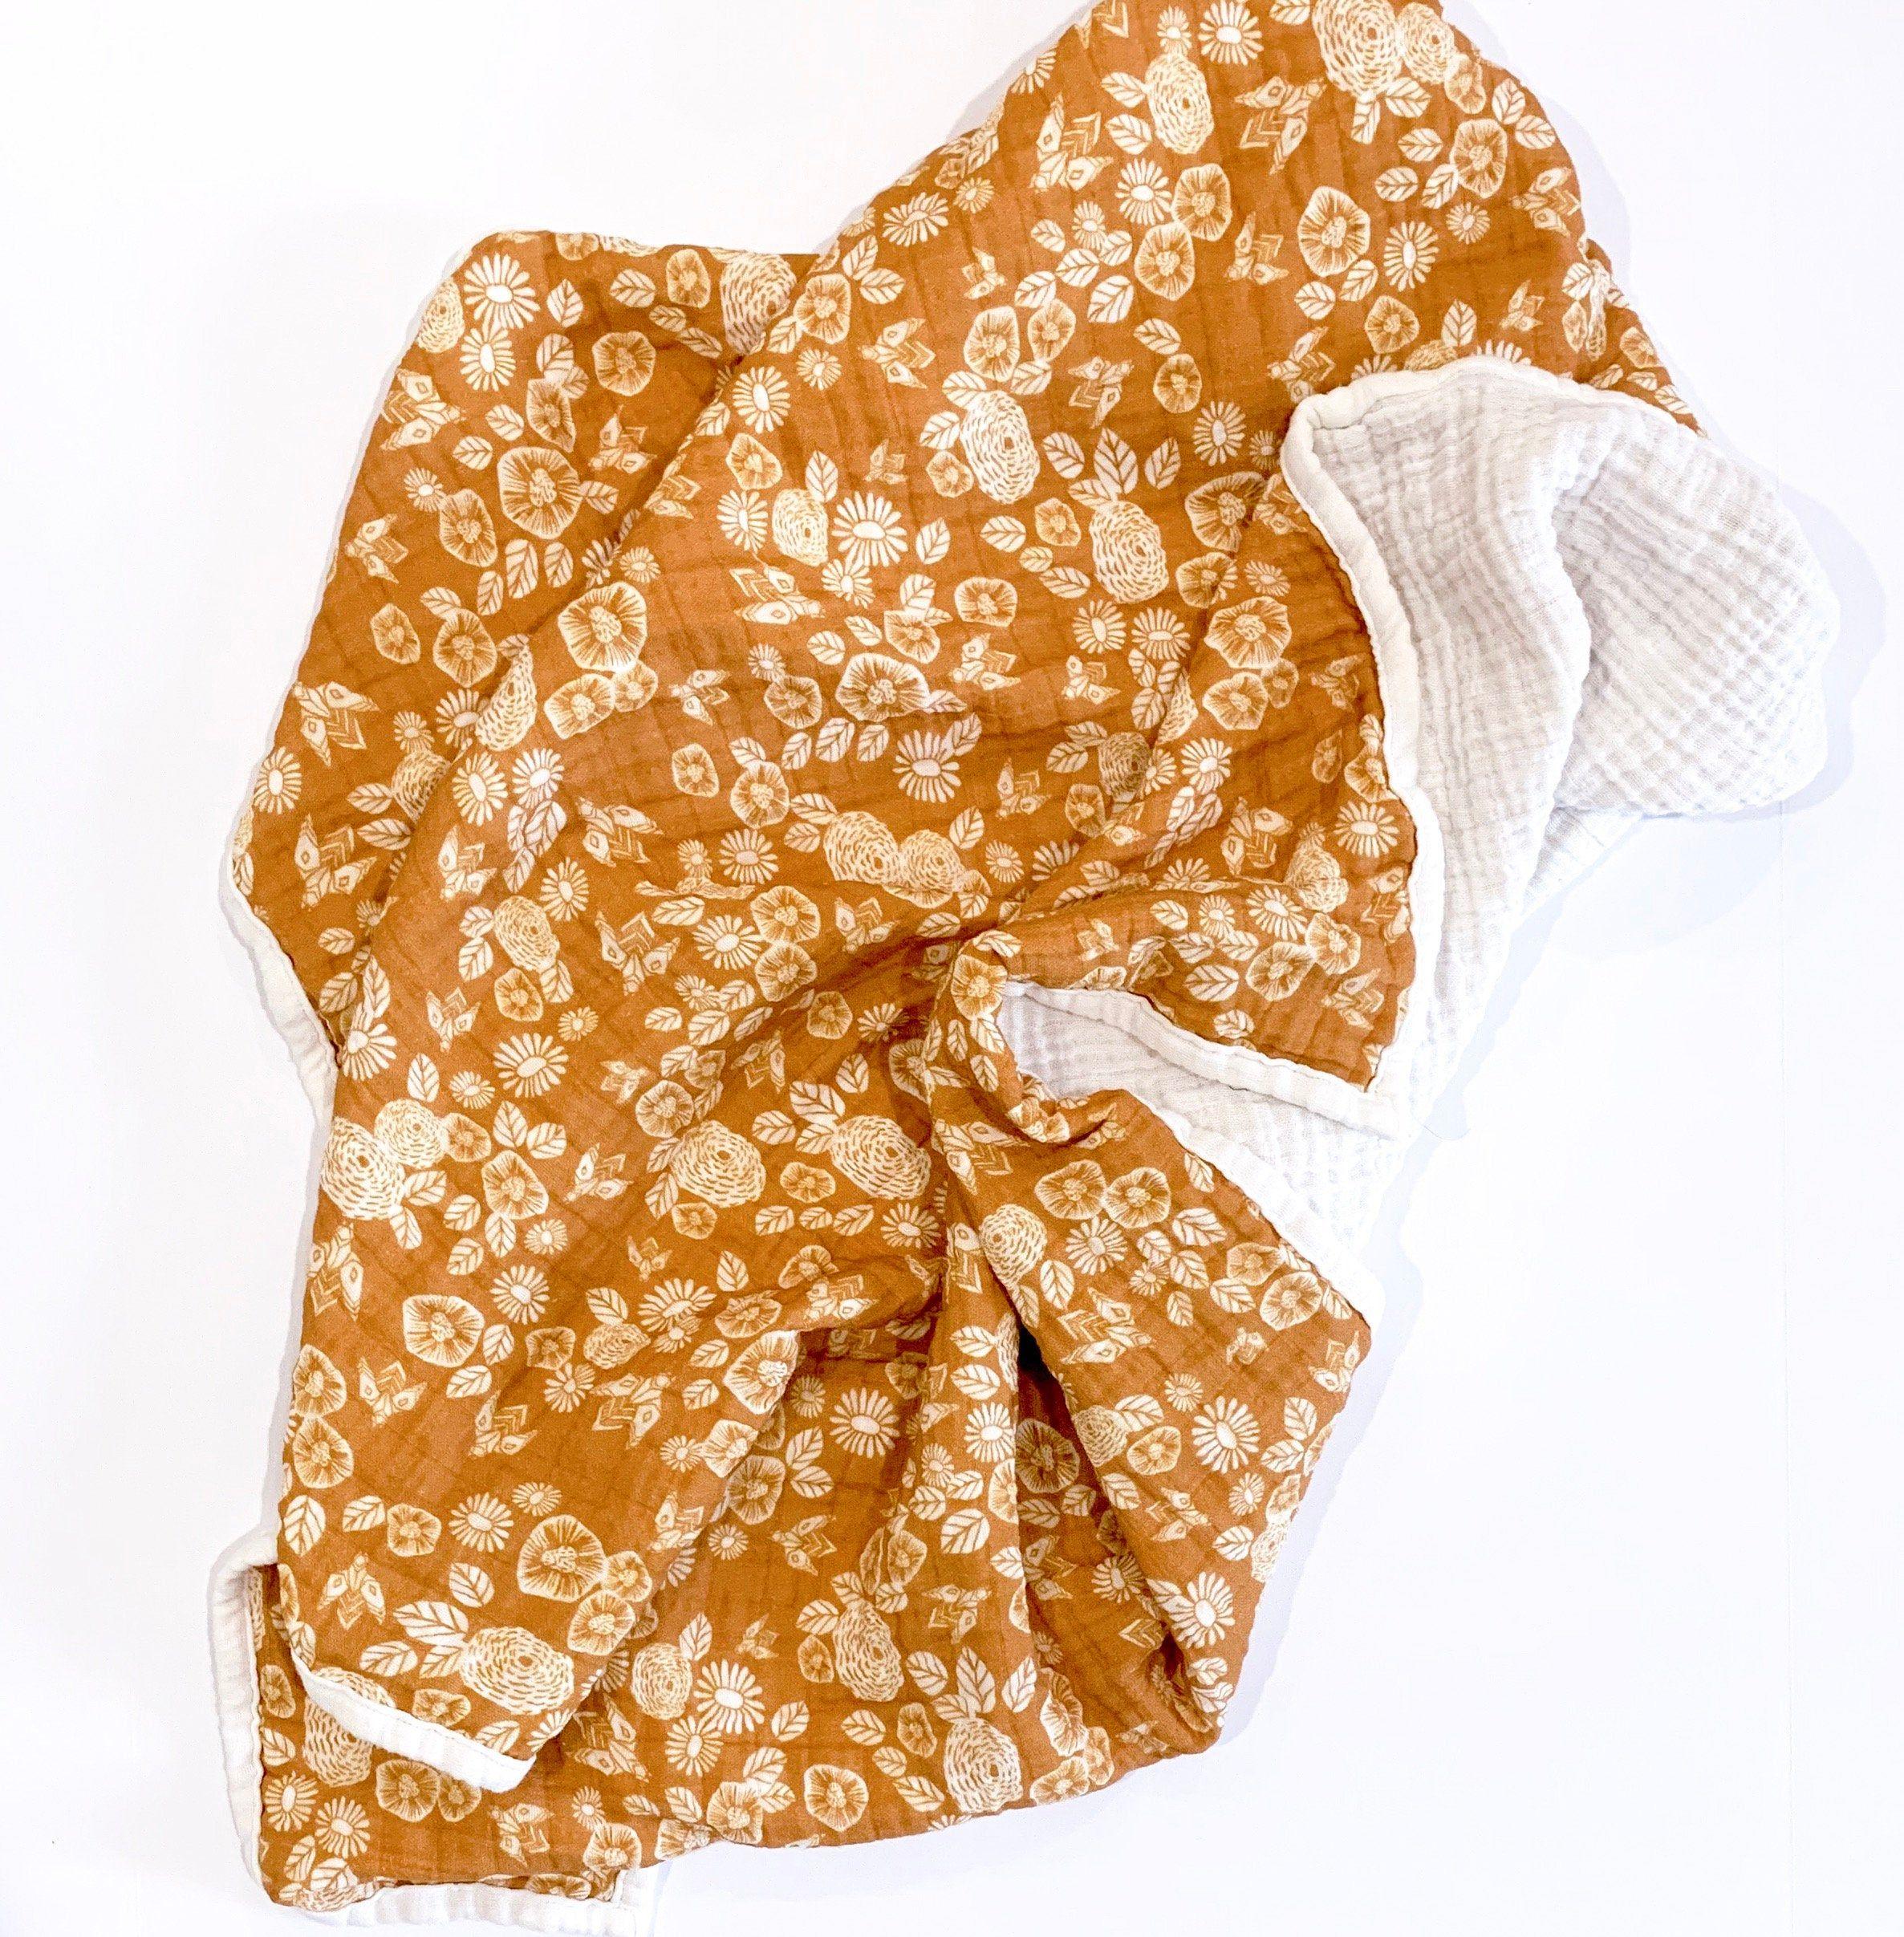 Mustard Florals Deluxe Muslin Quilt Bee Garden Baby Blanket Double Gauze Yellow Gold Marigold Earth Tones G Baby Girl Shower Gifts Quilts Toned Girls